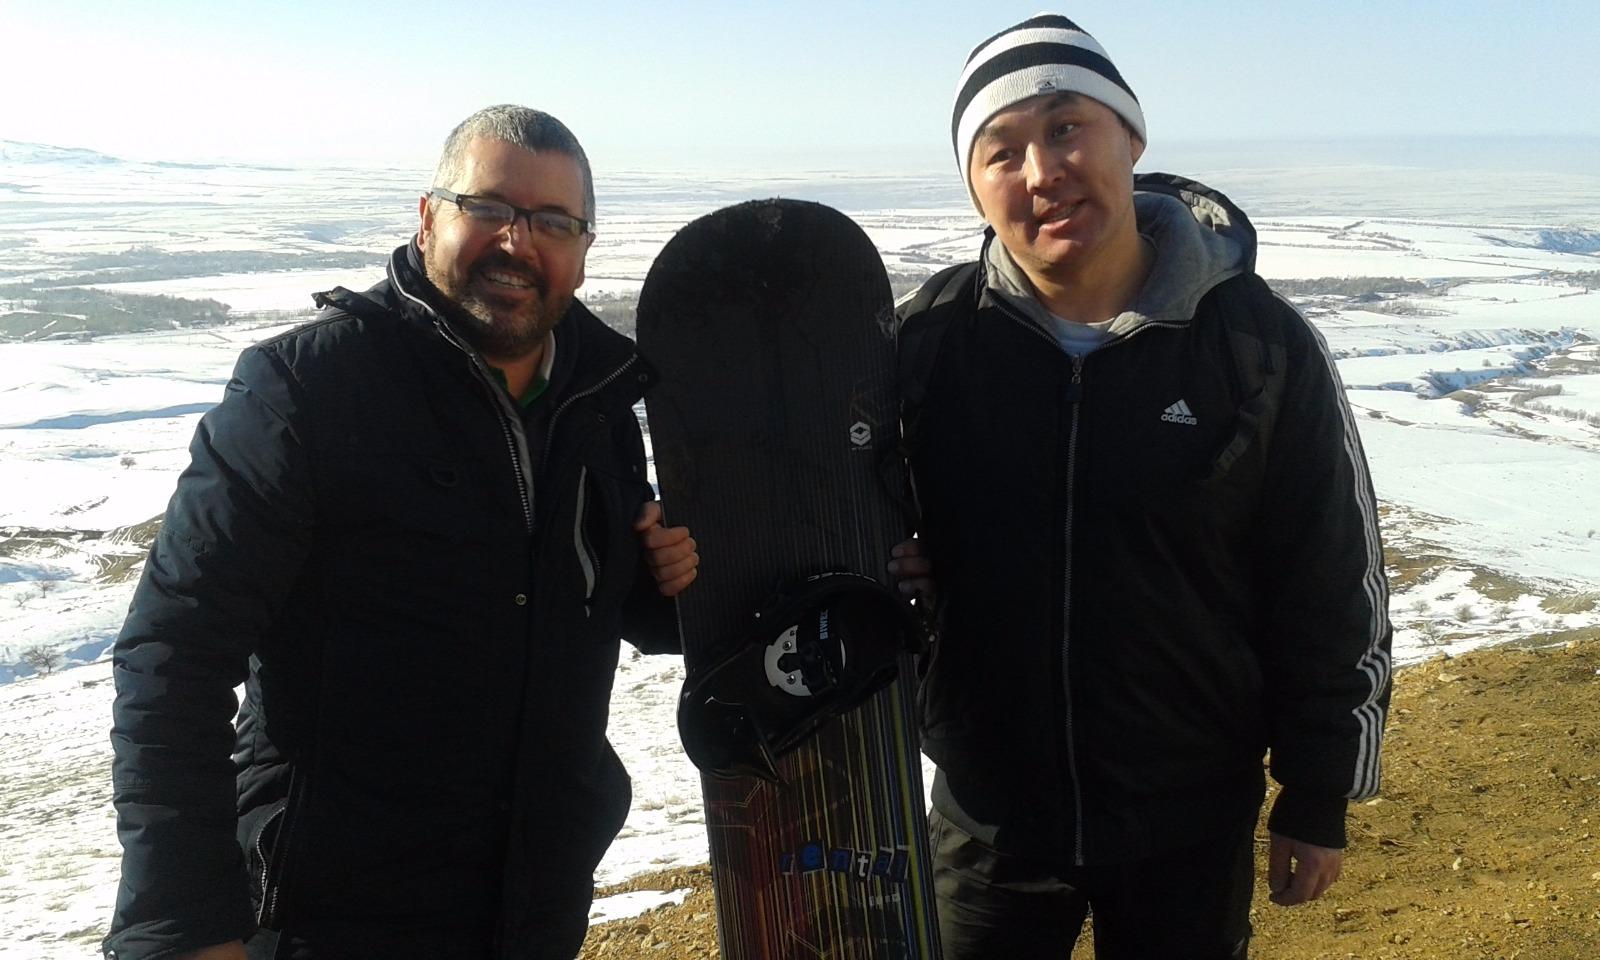 Snowboarding with the best Kazakh Biology Teacher in Kazakhstan